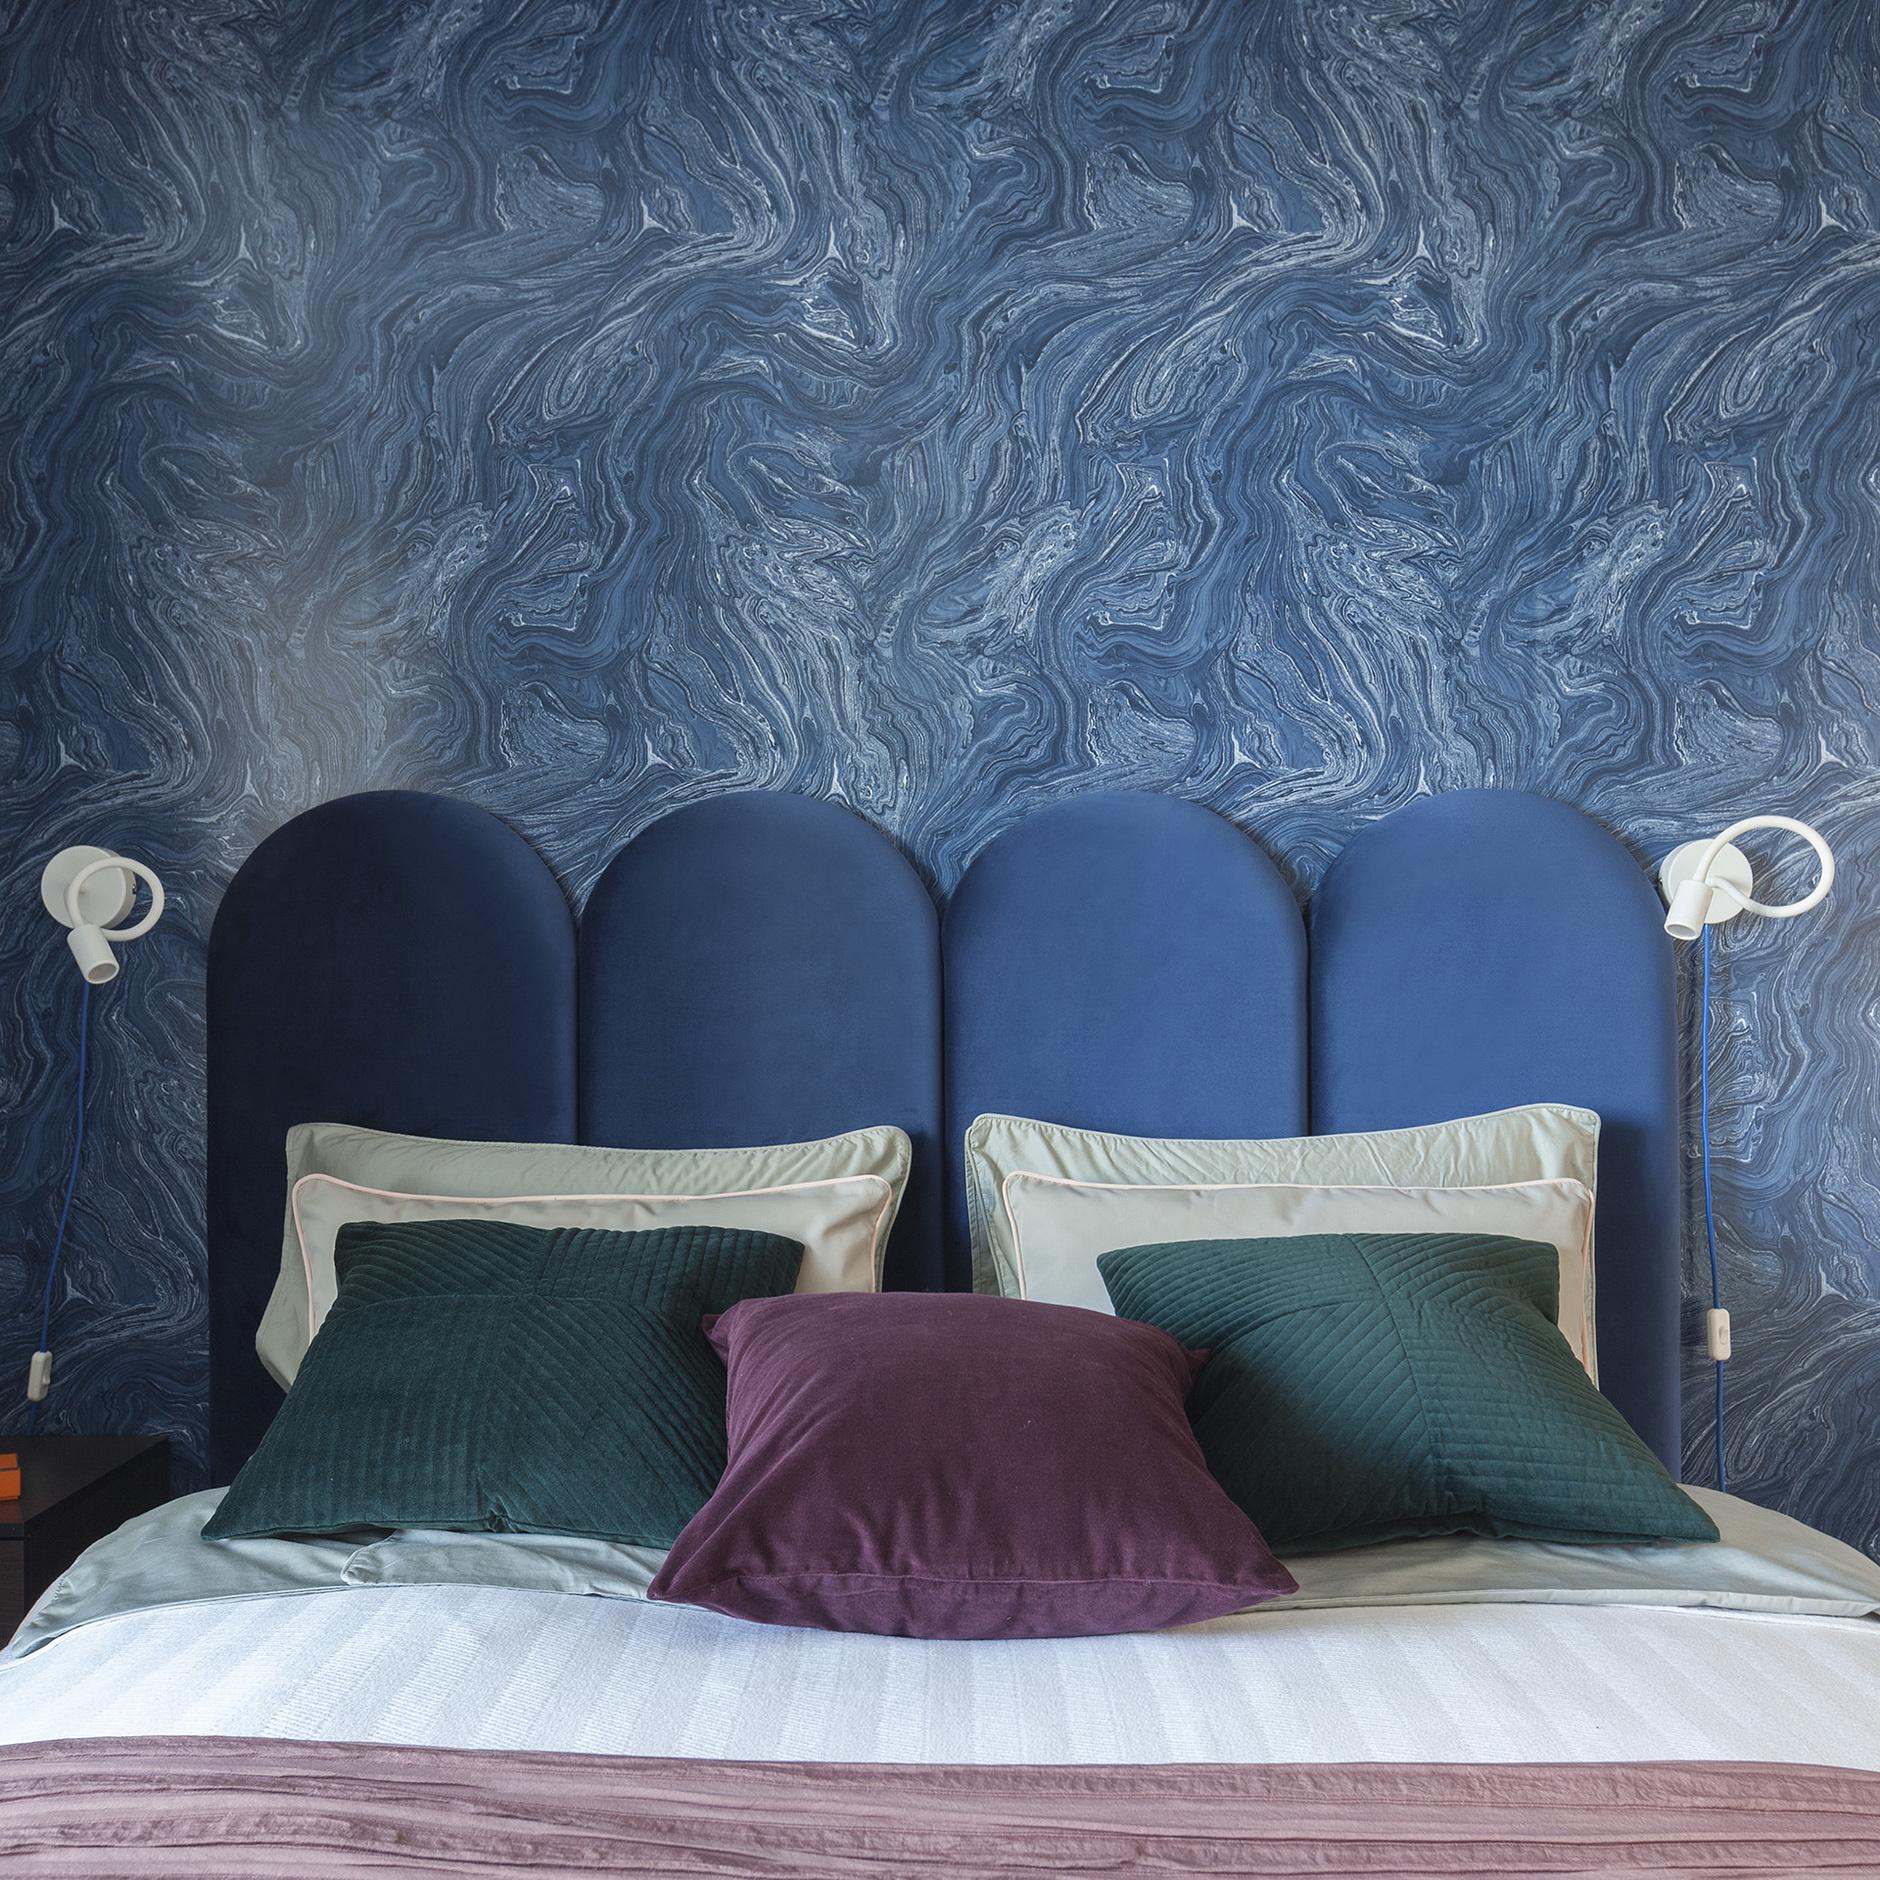 Синие спальни (галерея 0, фото 15)